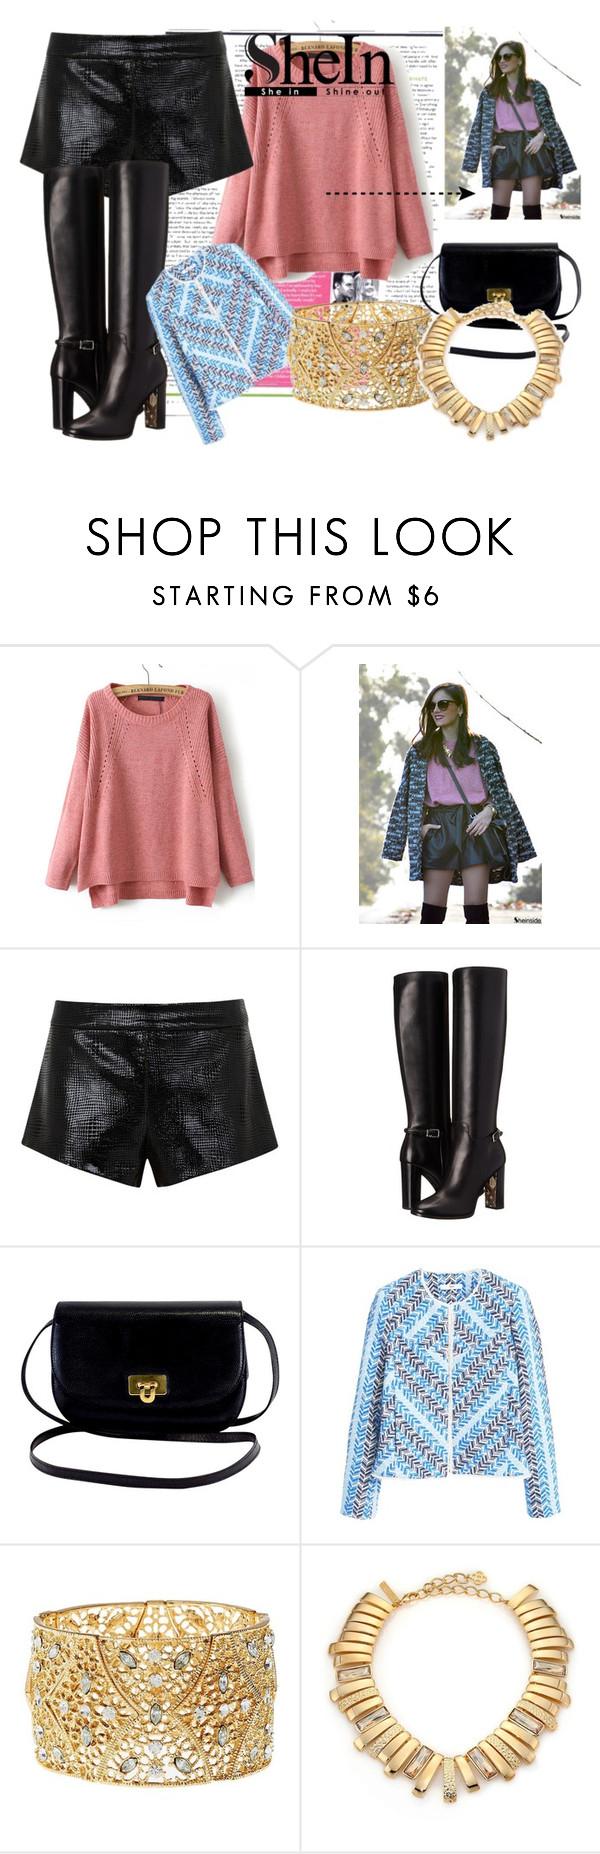 """Pinksweater"" by jelena-supreme ❤ liked on Polyvore featuring Mason by Michelle Mason, Burberry, MANGO, Charlotte Russe, Oscar de la Renta, vintage, GoldenGlobes, fashionWeek and pinkandblue"